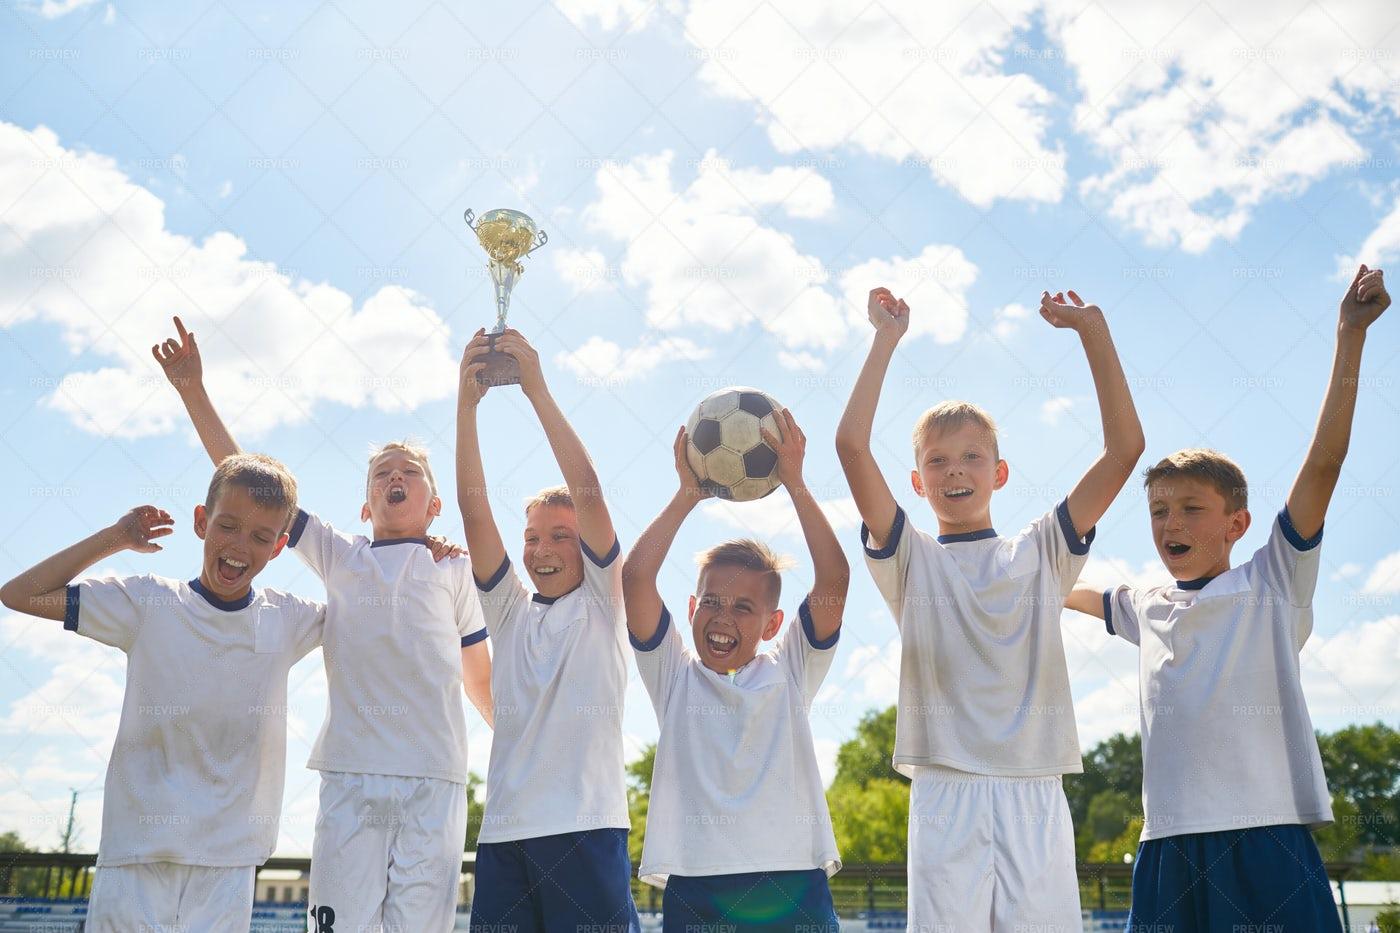 Boys Football Team Winning...: Stock Photos